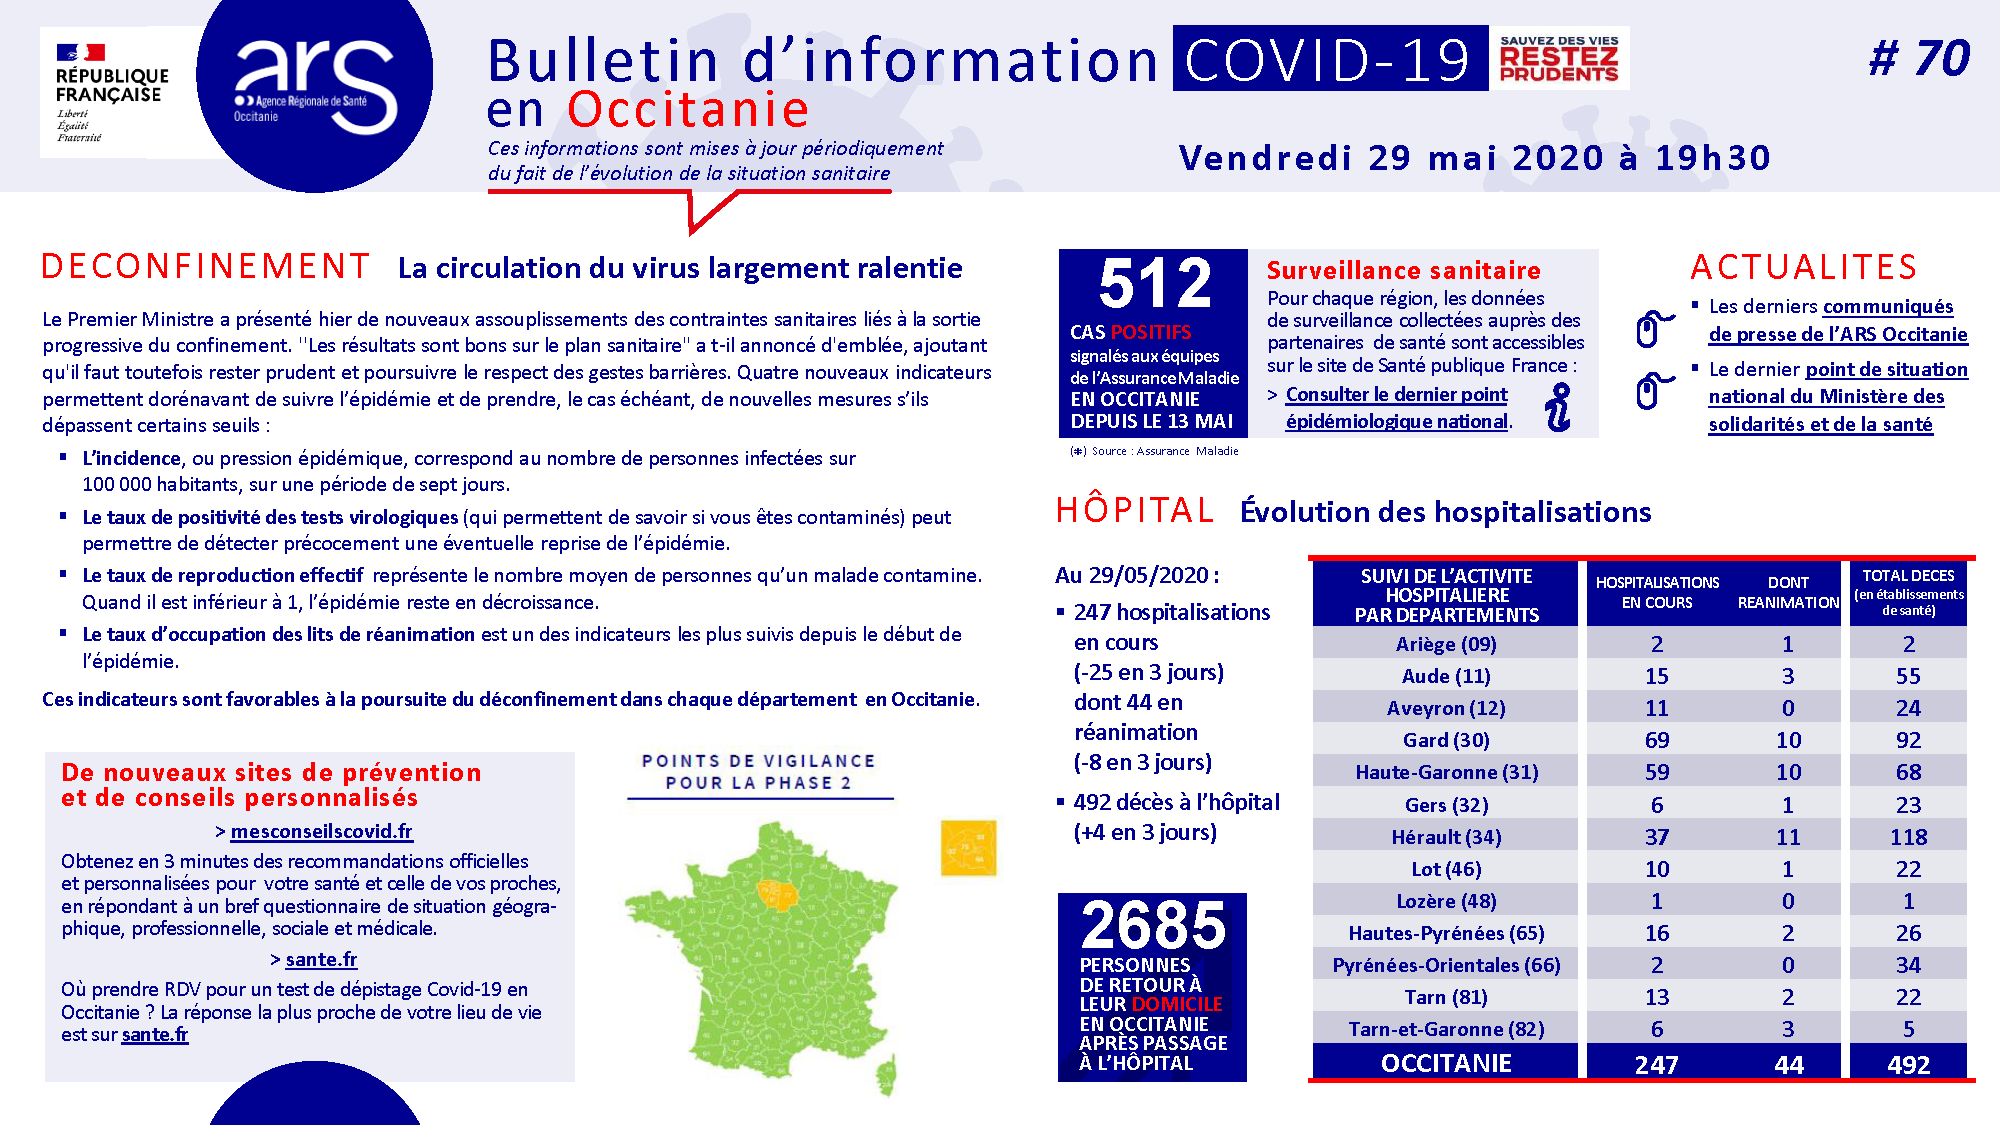 #COVID19. Bulletin d'information en Occitatanie #70 29/05/2020